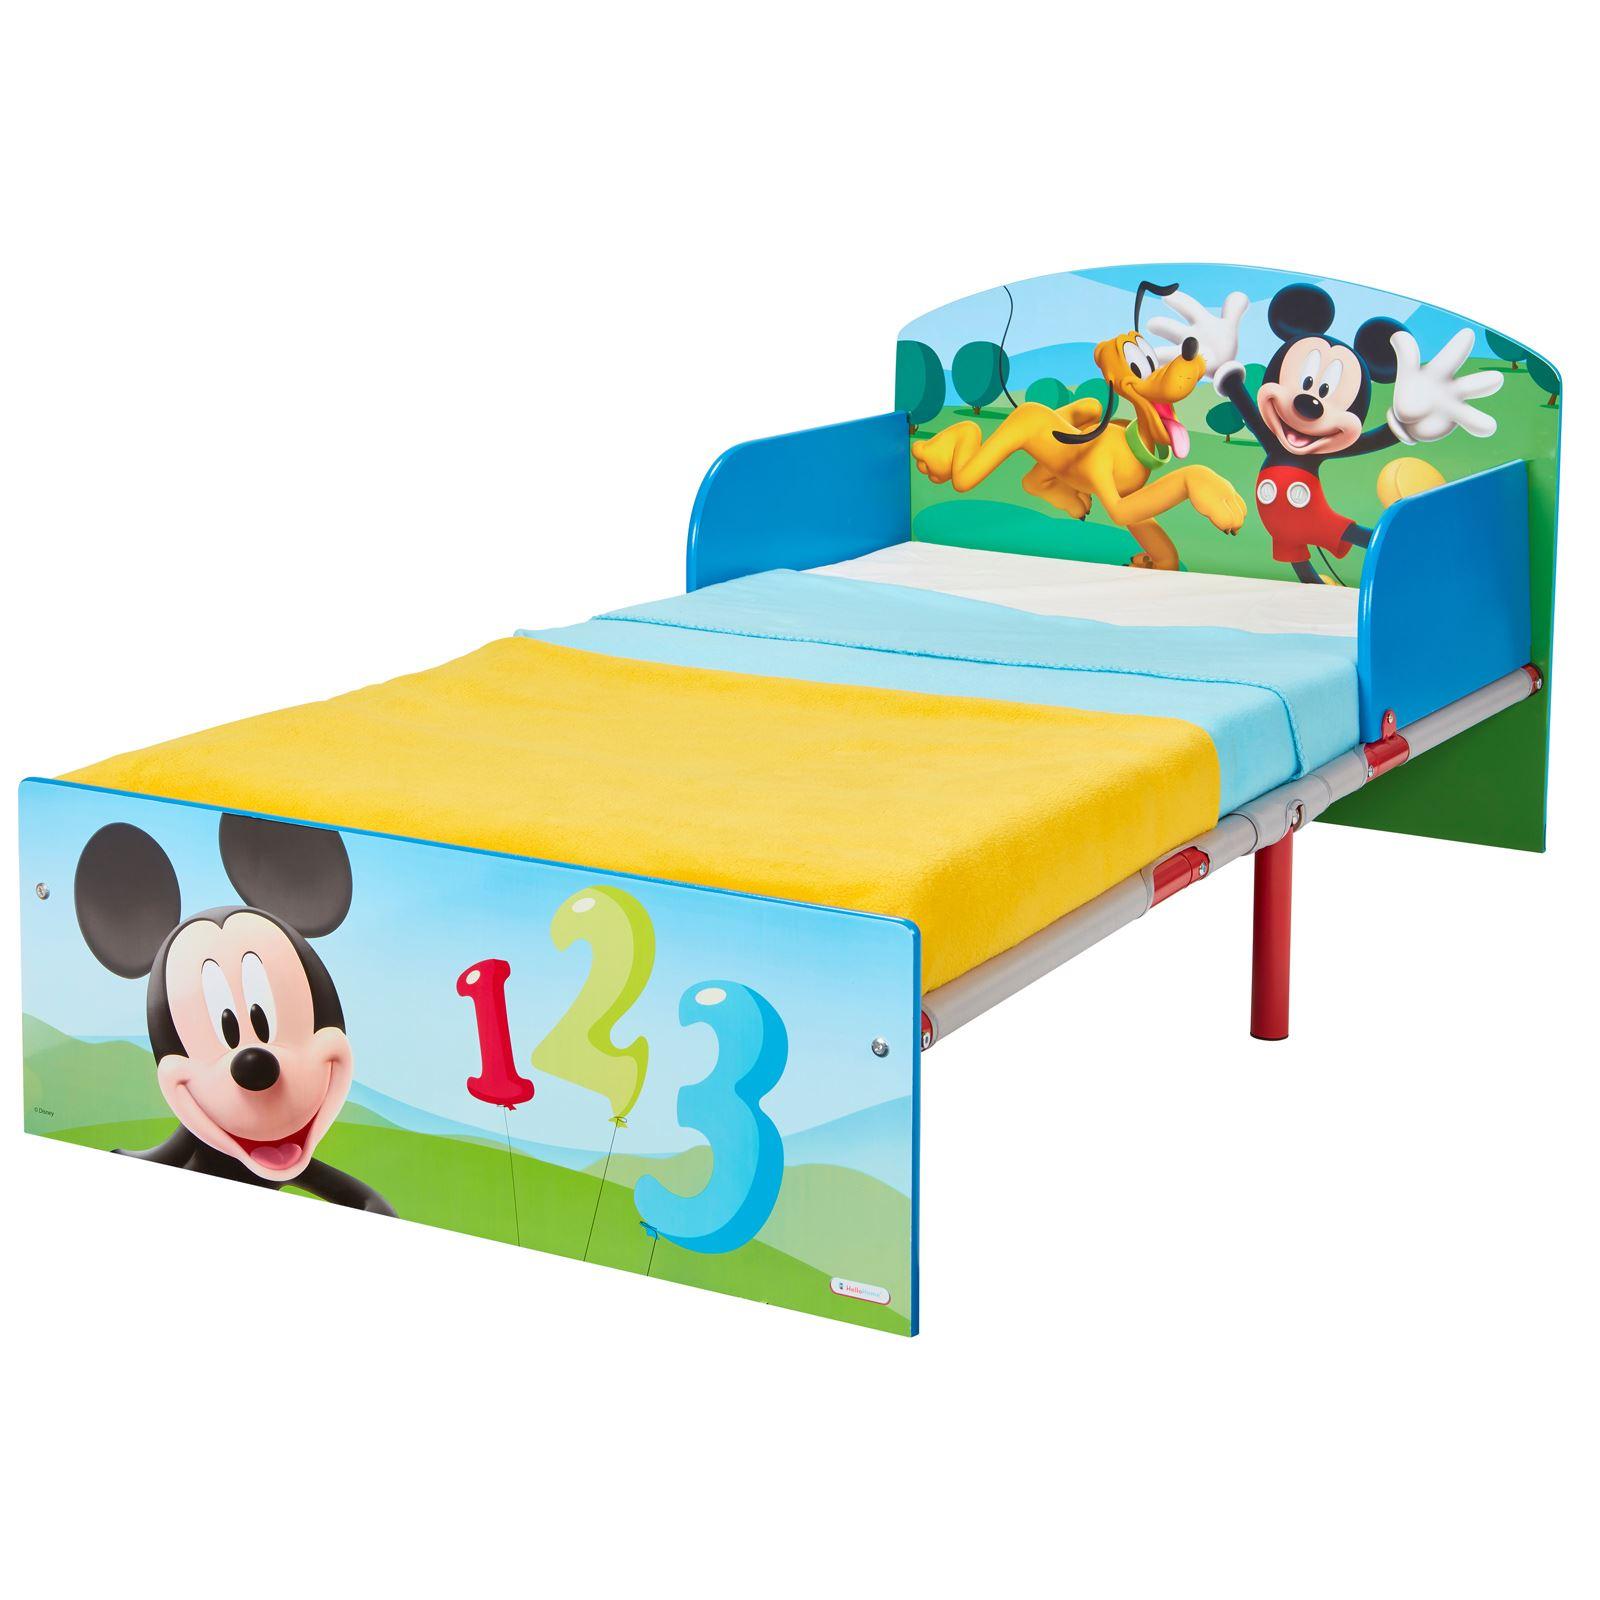 miniatura 20 - KIDS CHARACTER TODDLER BEDS - BOYS GIRLS BEDROOM DISNEY